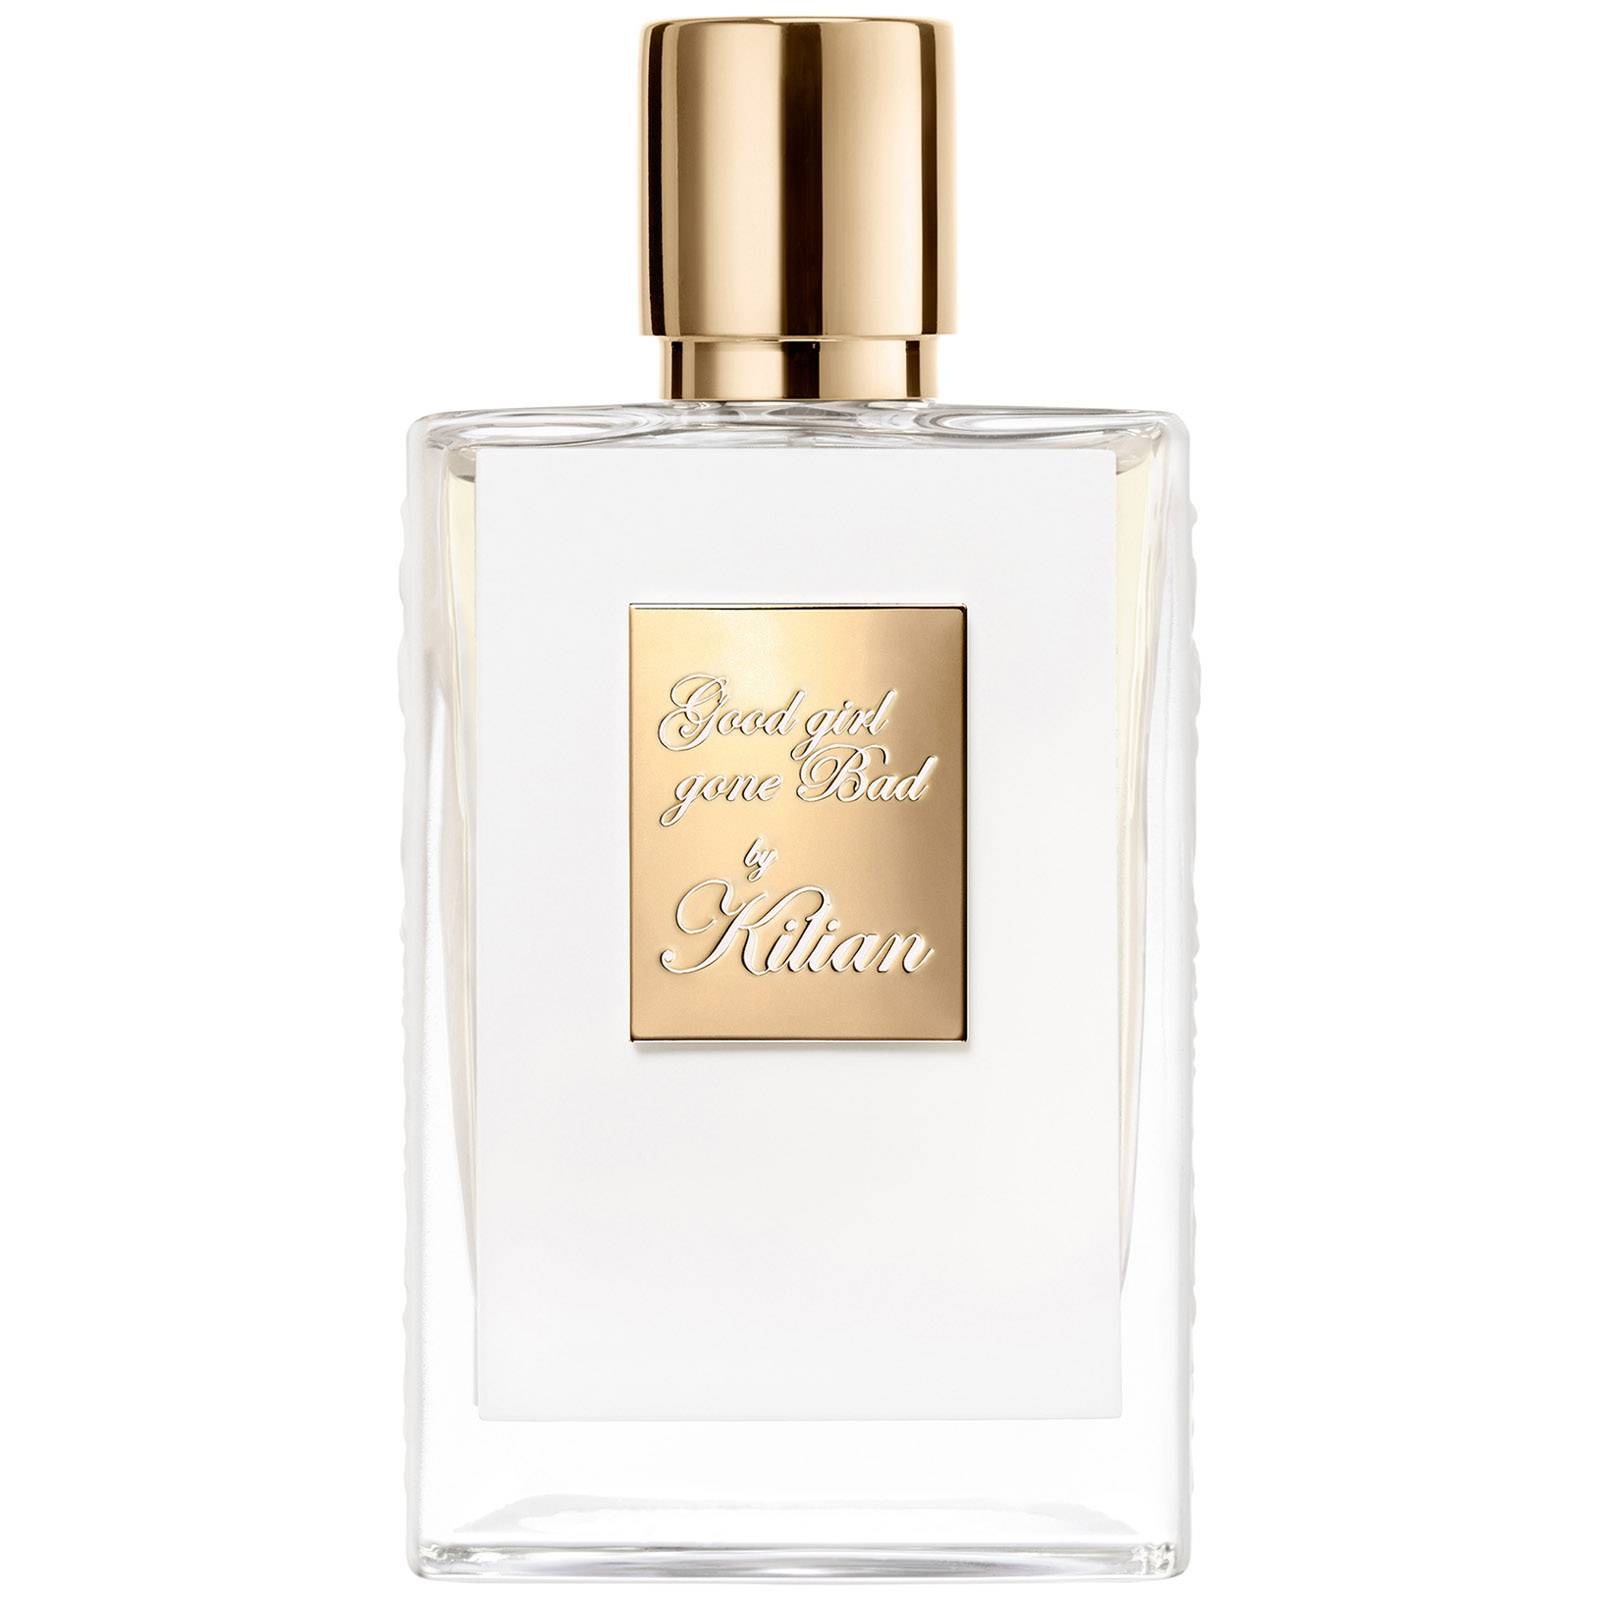 Kilian Good girl gone bad perfume parfum 50 ml  - White